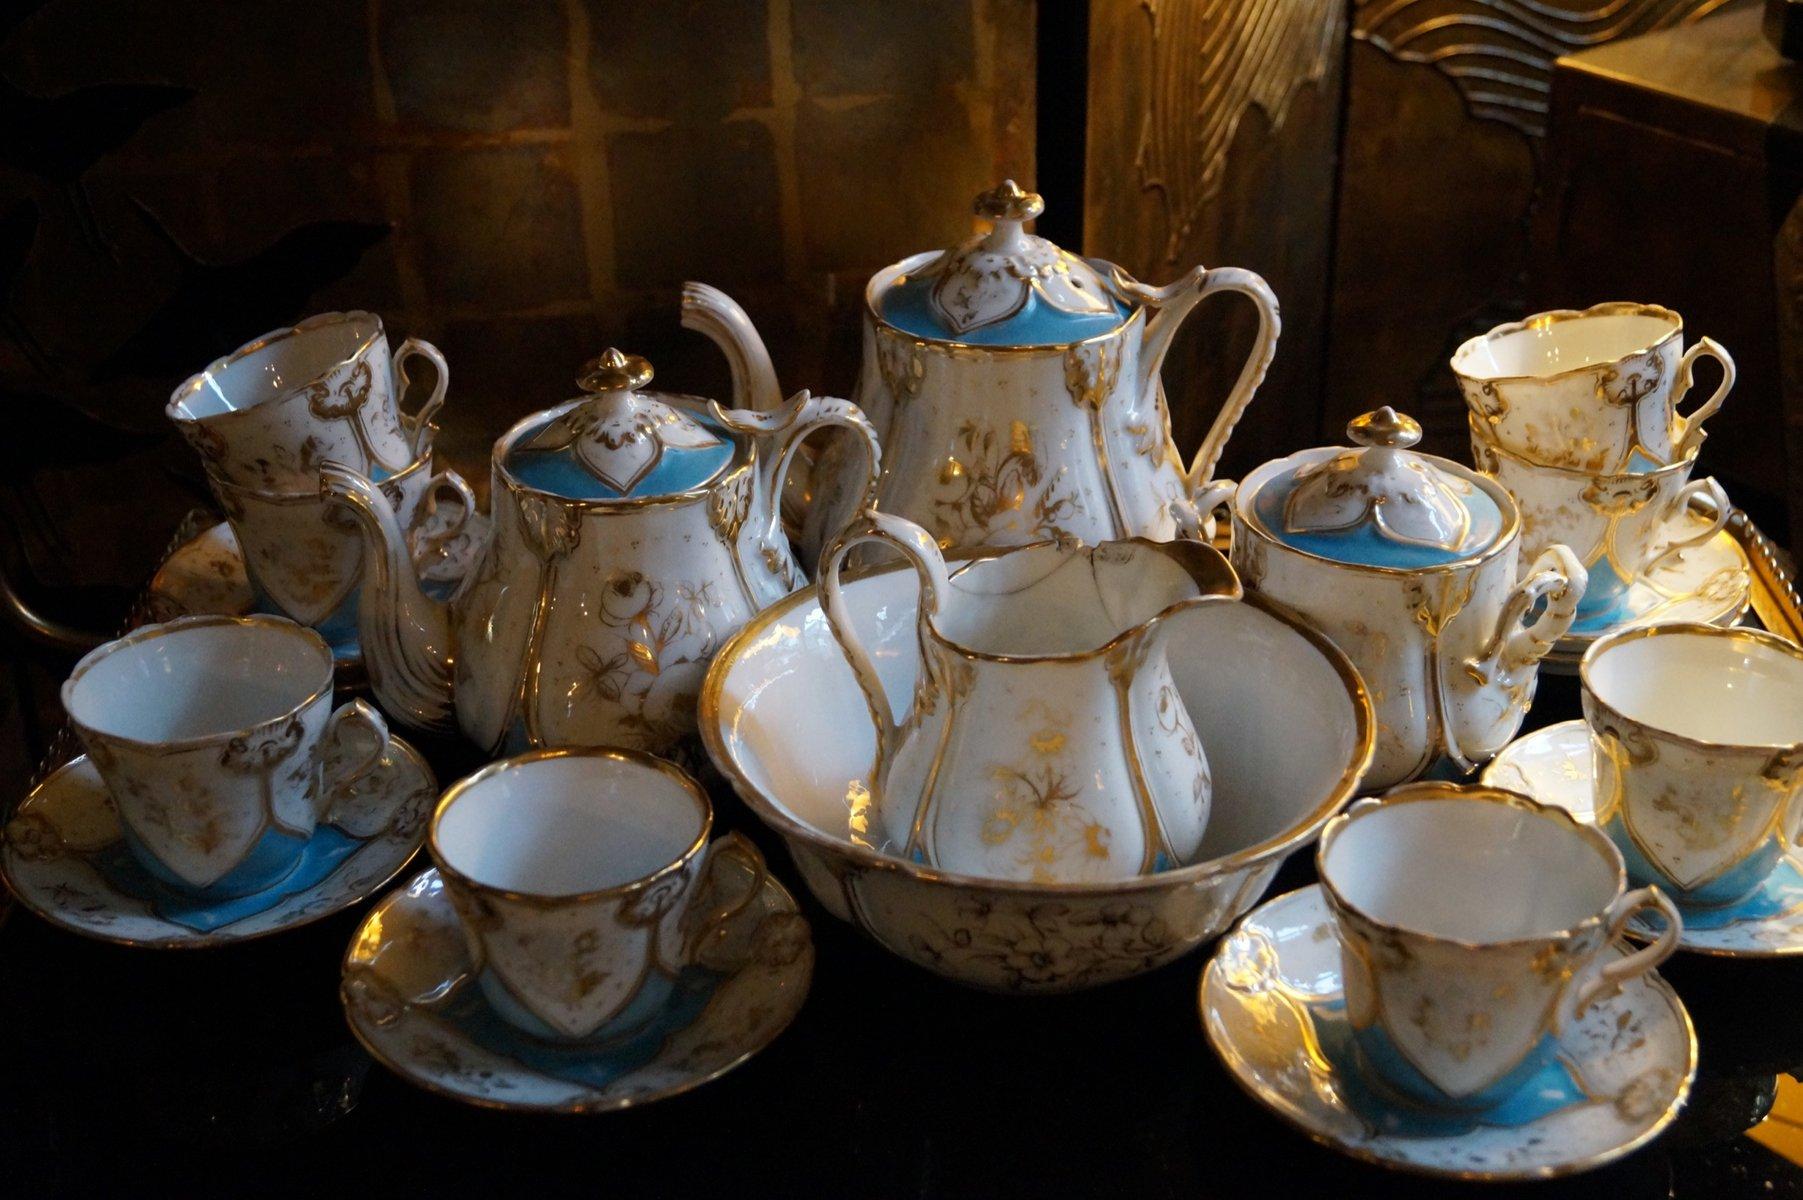 antikes pariser porzellan teeservice 1850 bei pamono kaufen. Black Bedroom Furniture Sets. Home Design Ideas